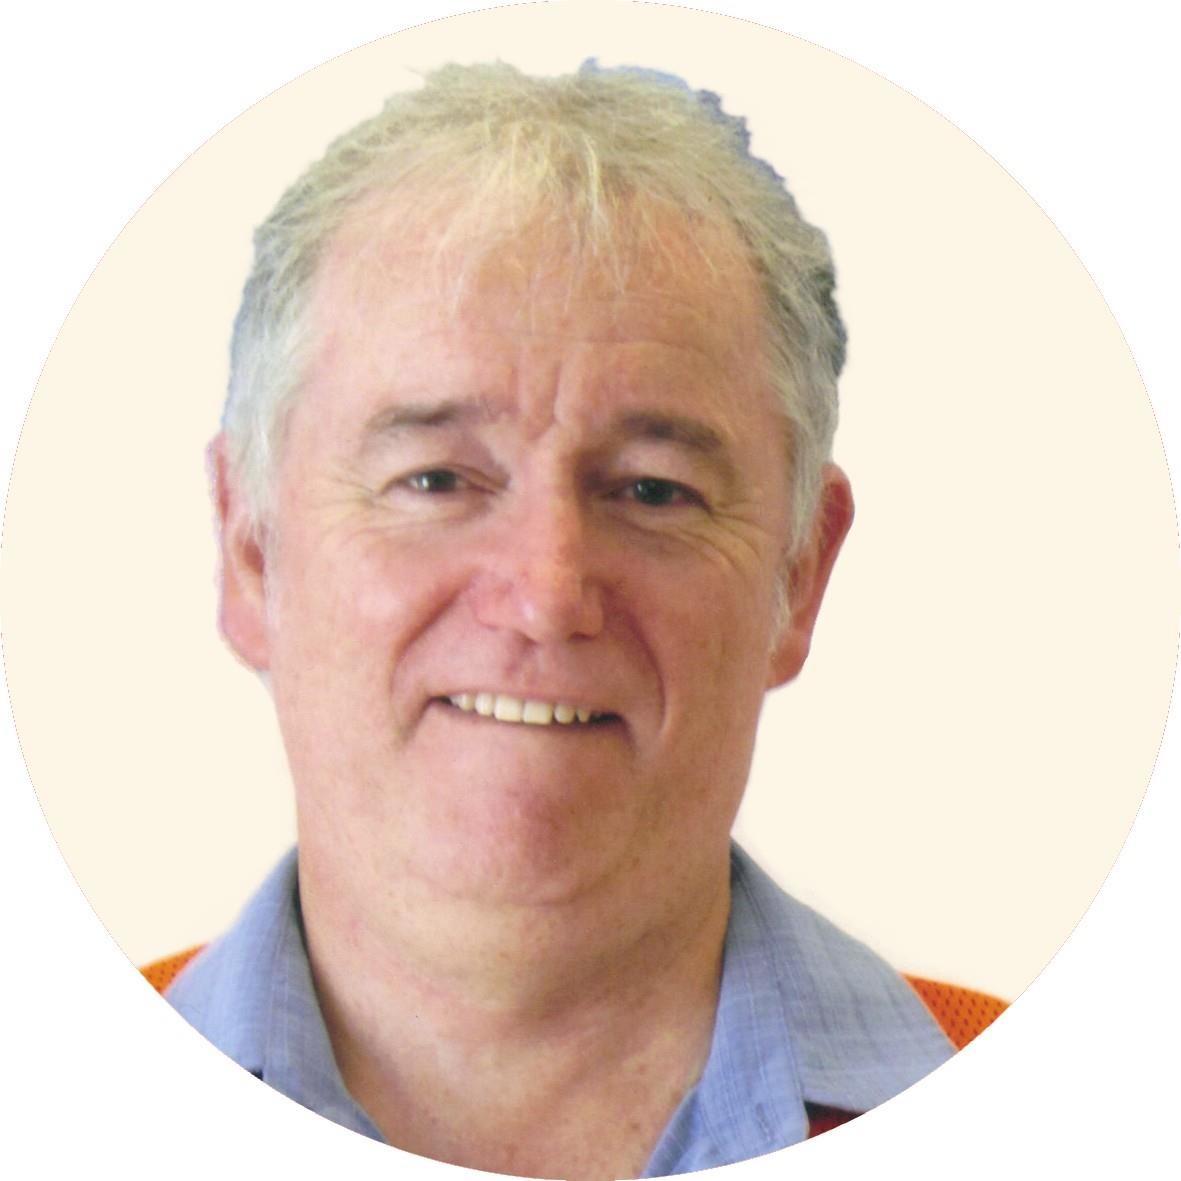 Ian Newman